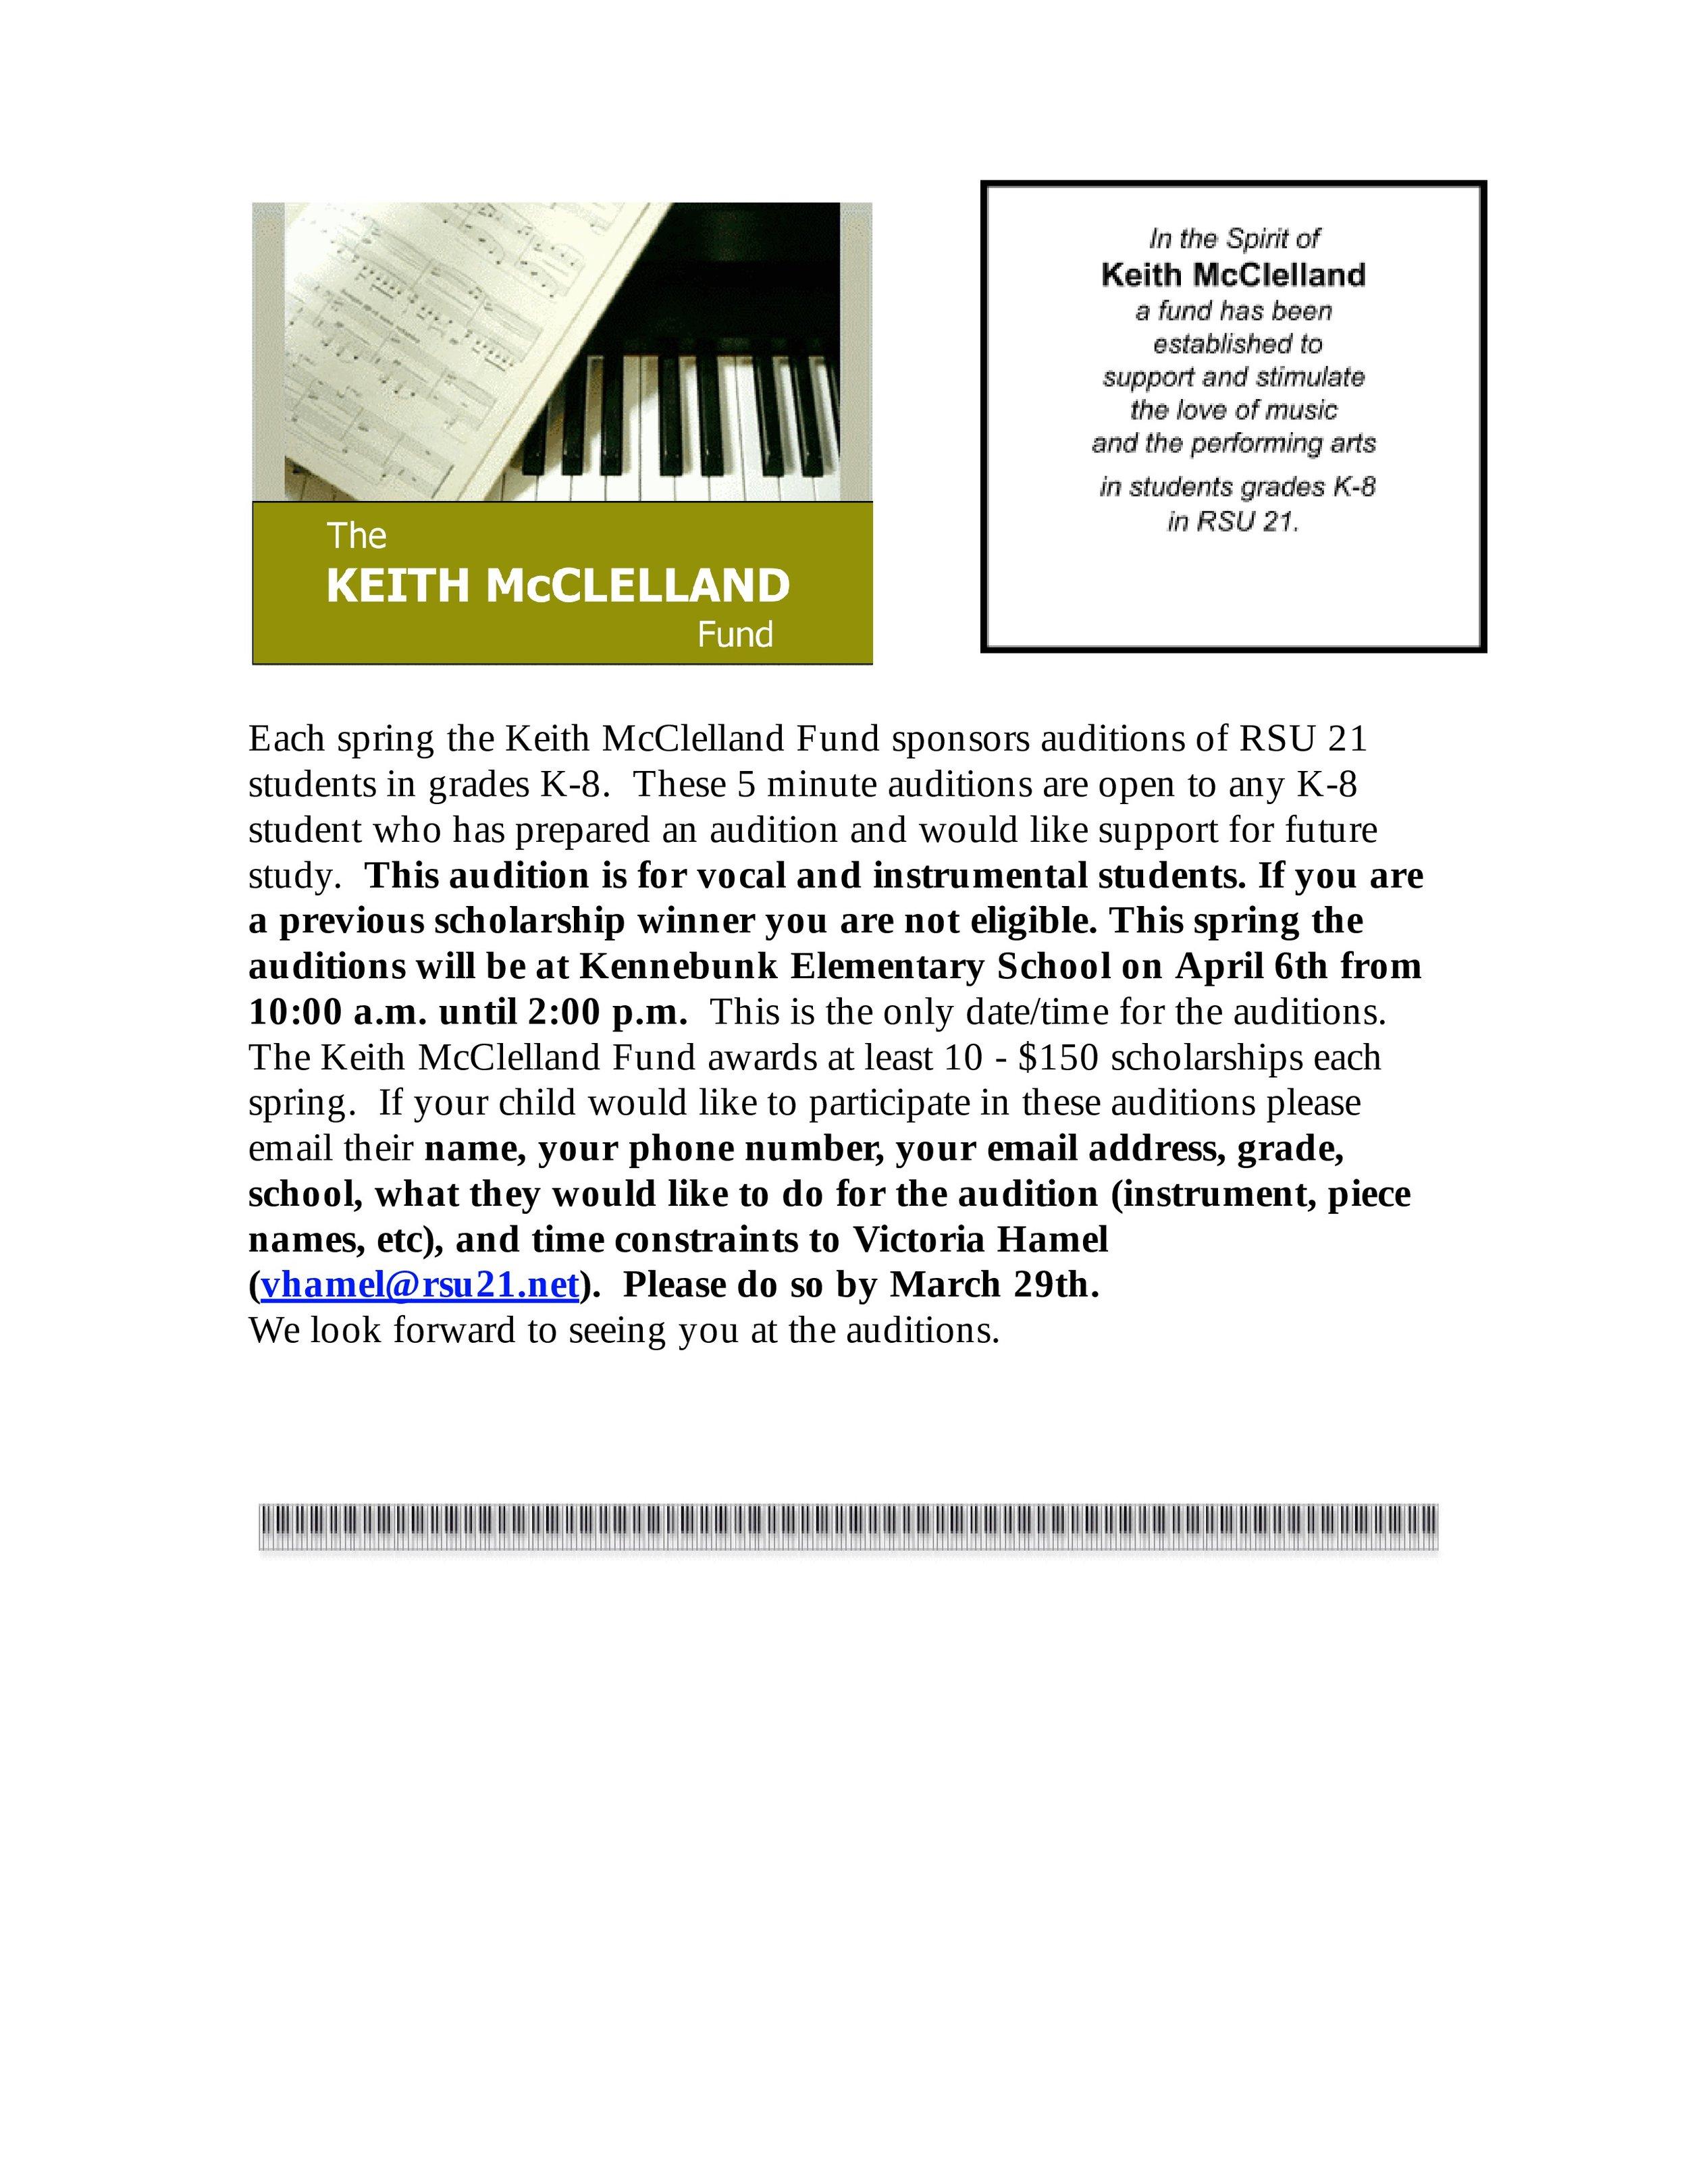 McClelland_auditions_flyer2019 - Google Docs-page-0.jpg